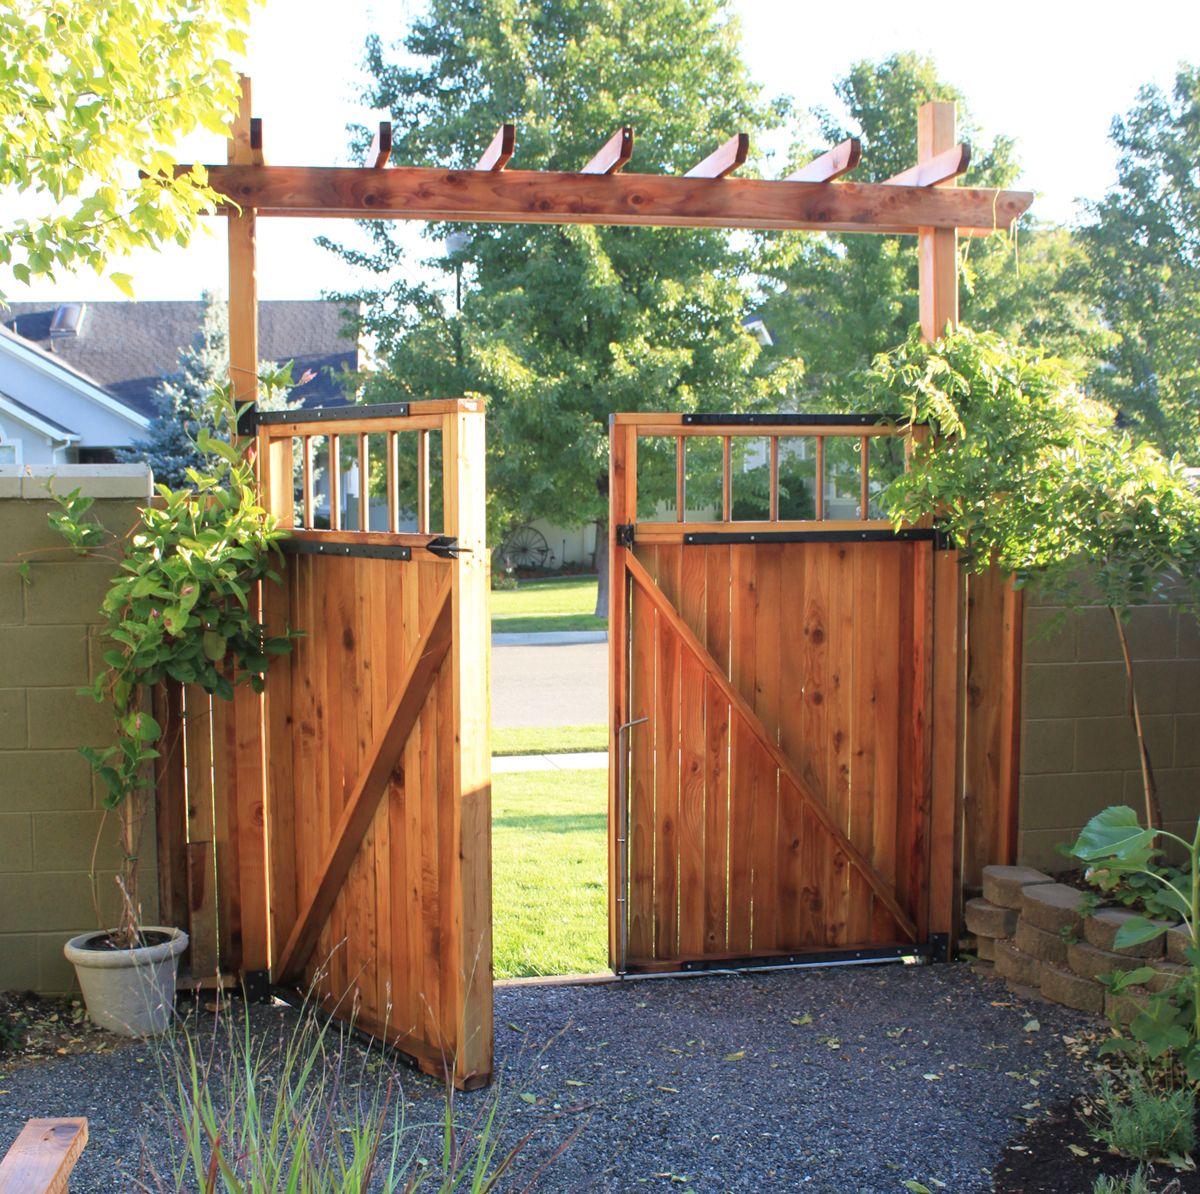 Fence Gate Arbor: Backyard Gates, Outdoor Gate, Backyard